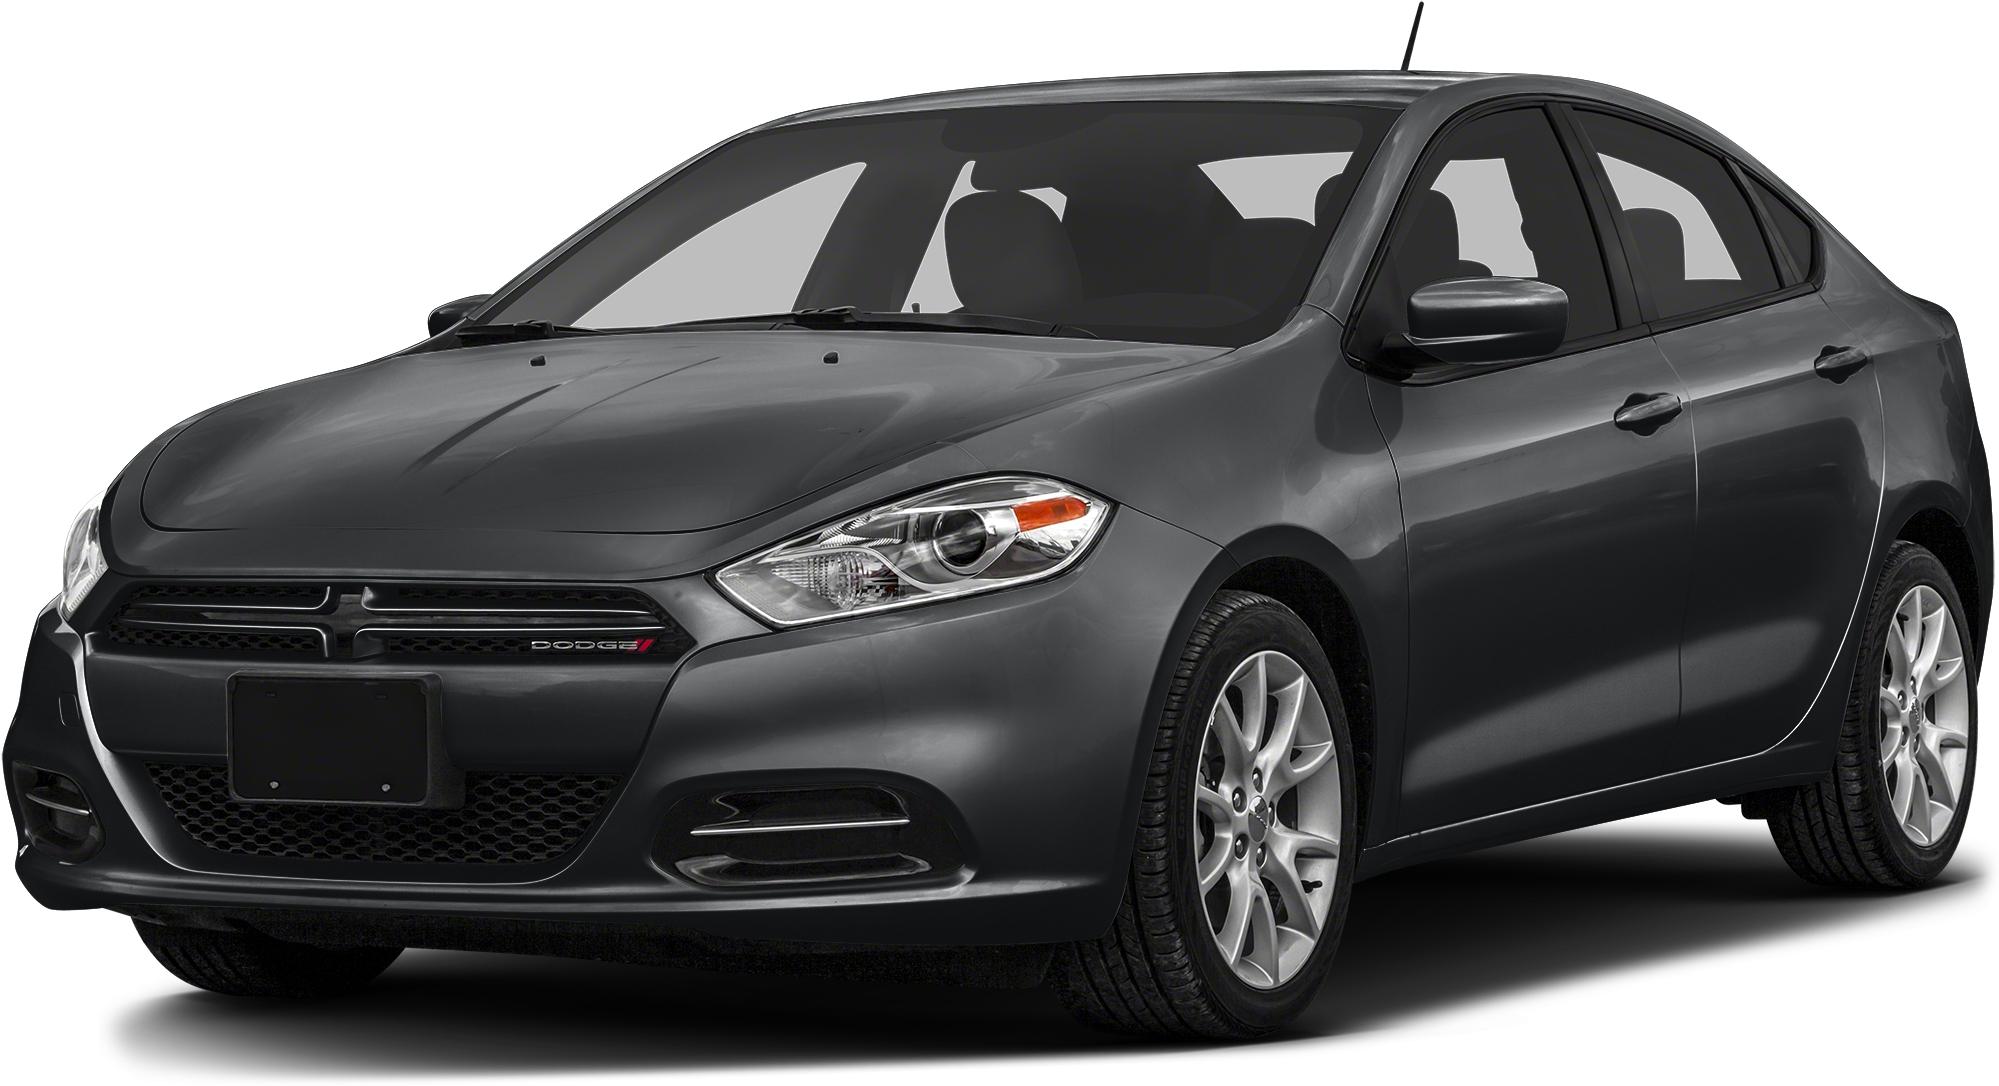 Auto Dealers Topeka Ks 2018 Dodge Reviews